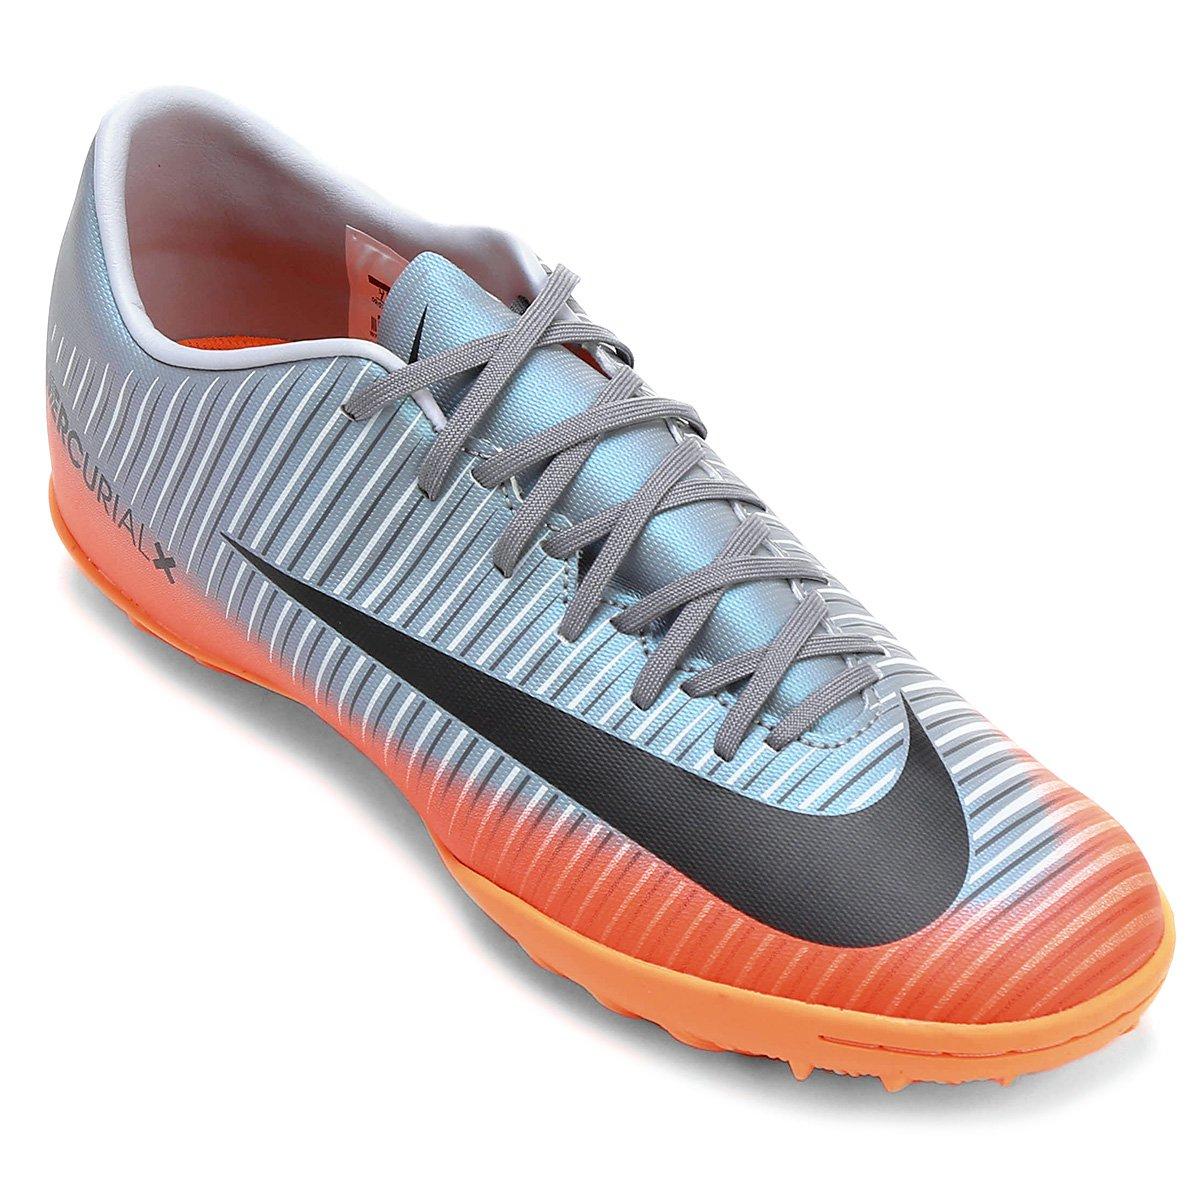 1525ea90aa454 Chuteira Society Nike Mercurial X Victory 6 CR7 TF | Shop Timão